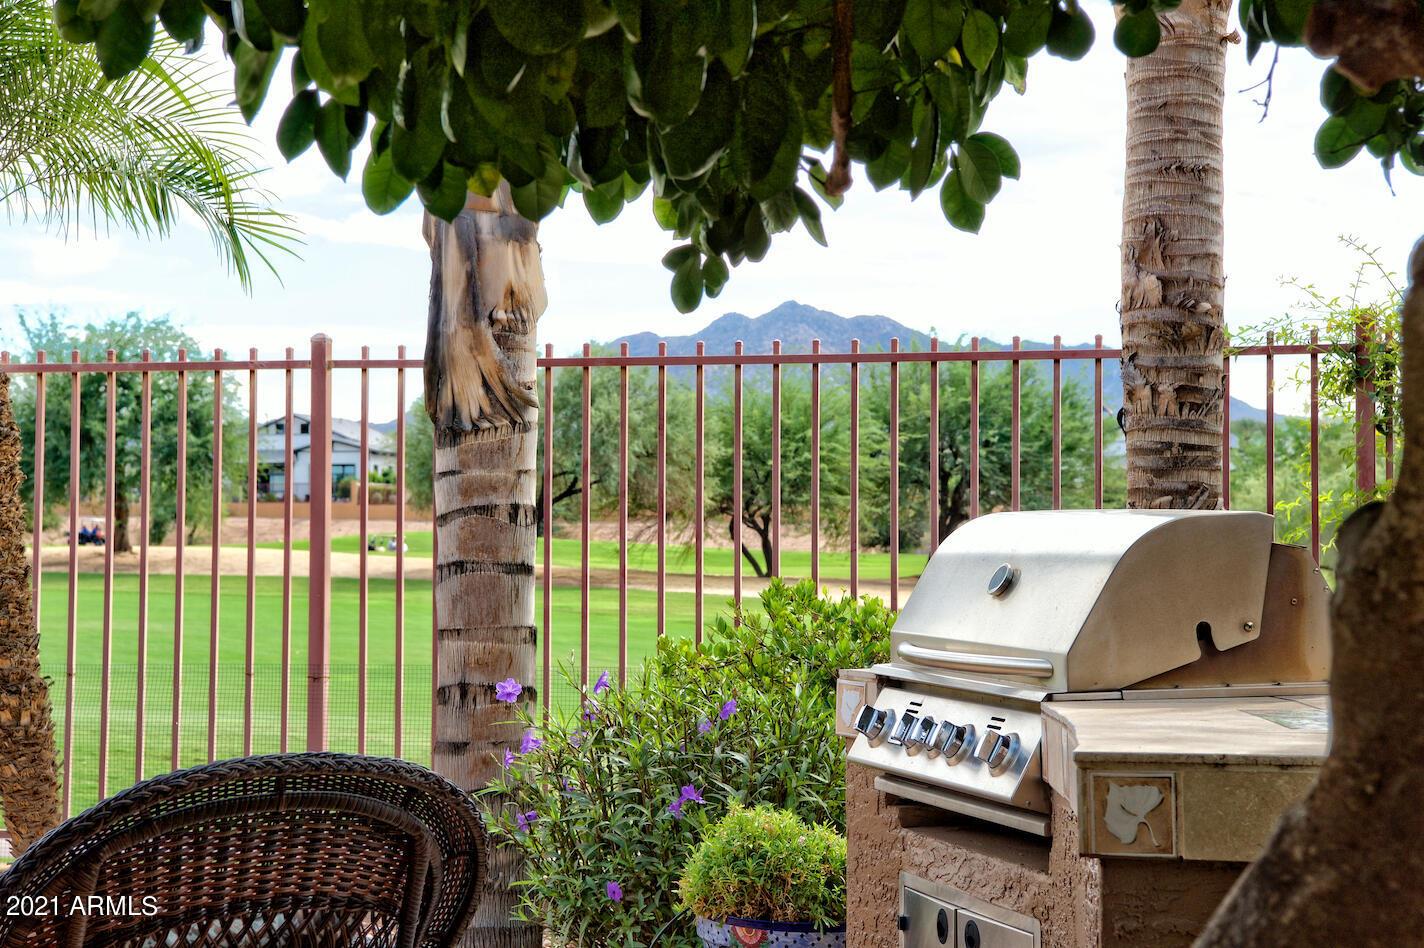 MLS 6307019 3953 E MEADOWVIEW Drive, Gilbert, AZ 85298 Eco-Friendly Homes